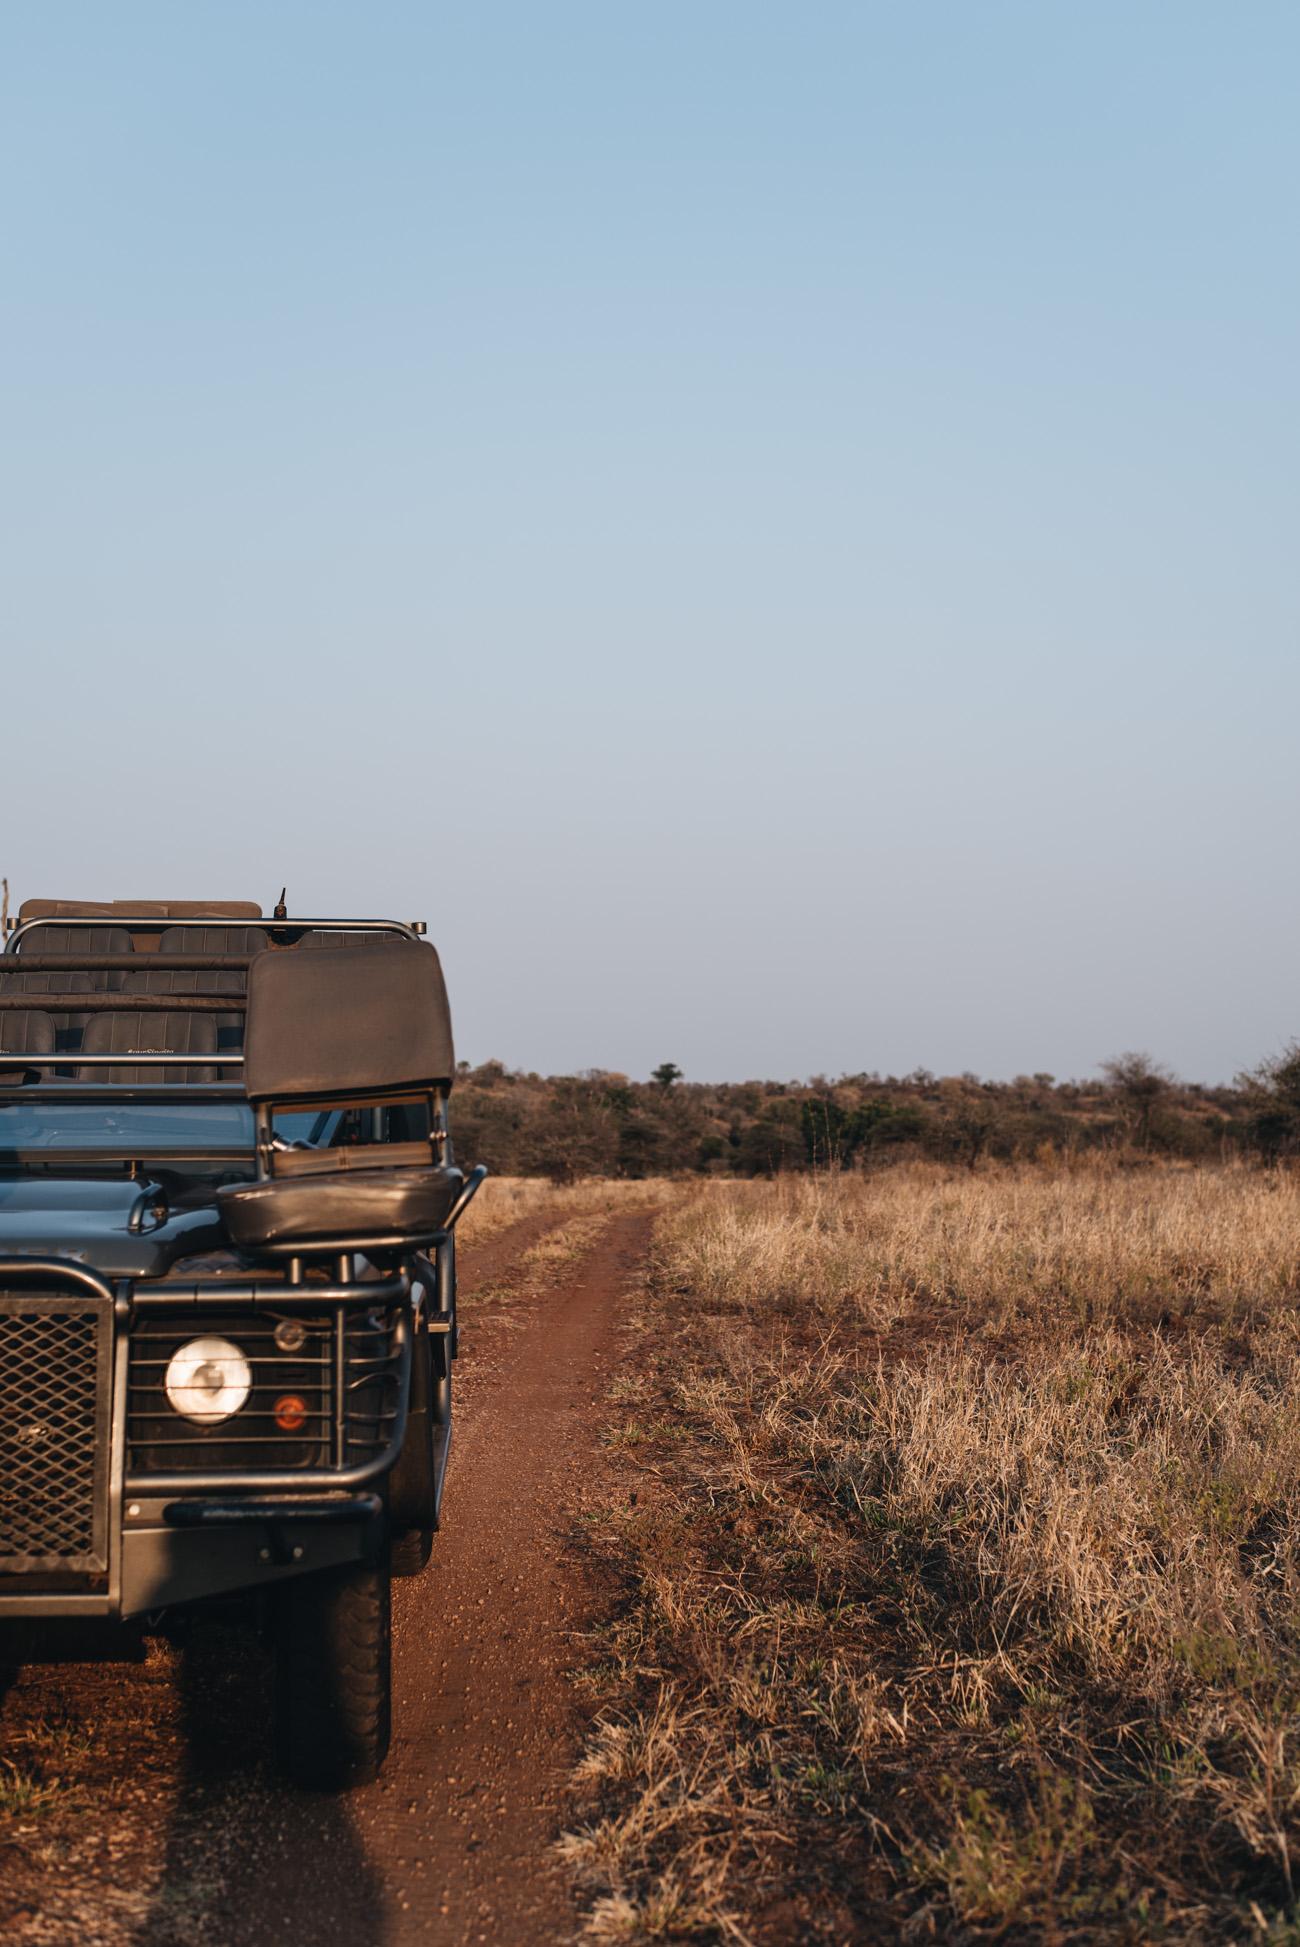 Singita-Safari-Krüger-Nationalpark-südafrika-erfahrung-reise-tipps-Big-5-tierwelt-giraffe-löwe-leopard-büffel-kudu-emparla-zebra-travel-blogger-nina-schwichtenberg-fashiioncarpet